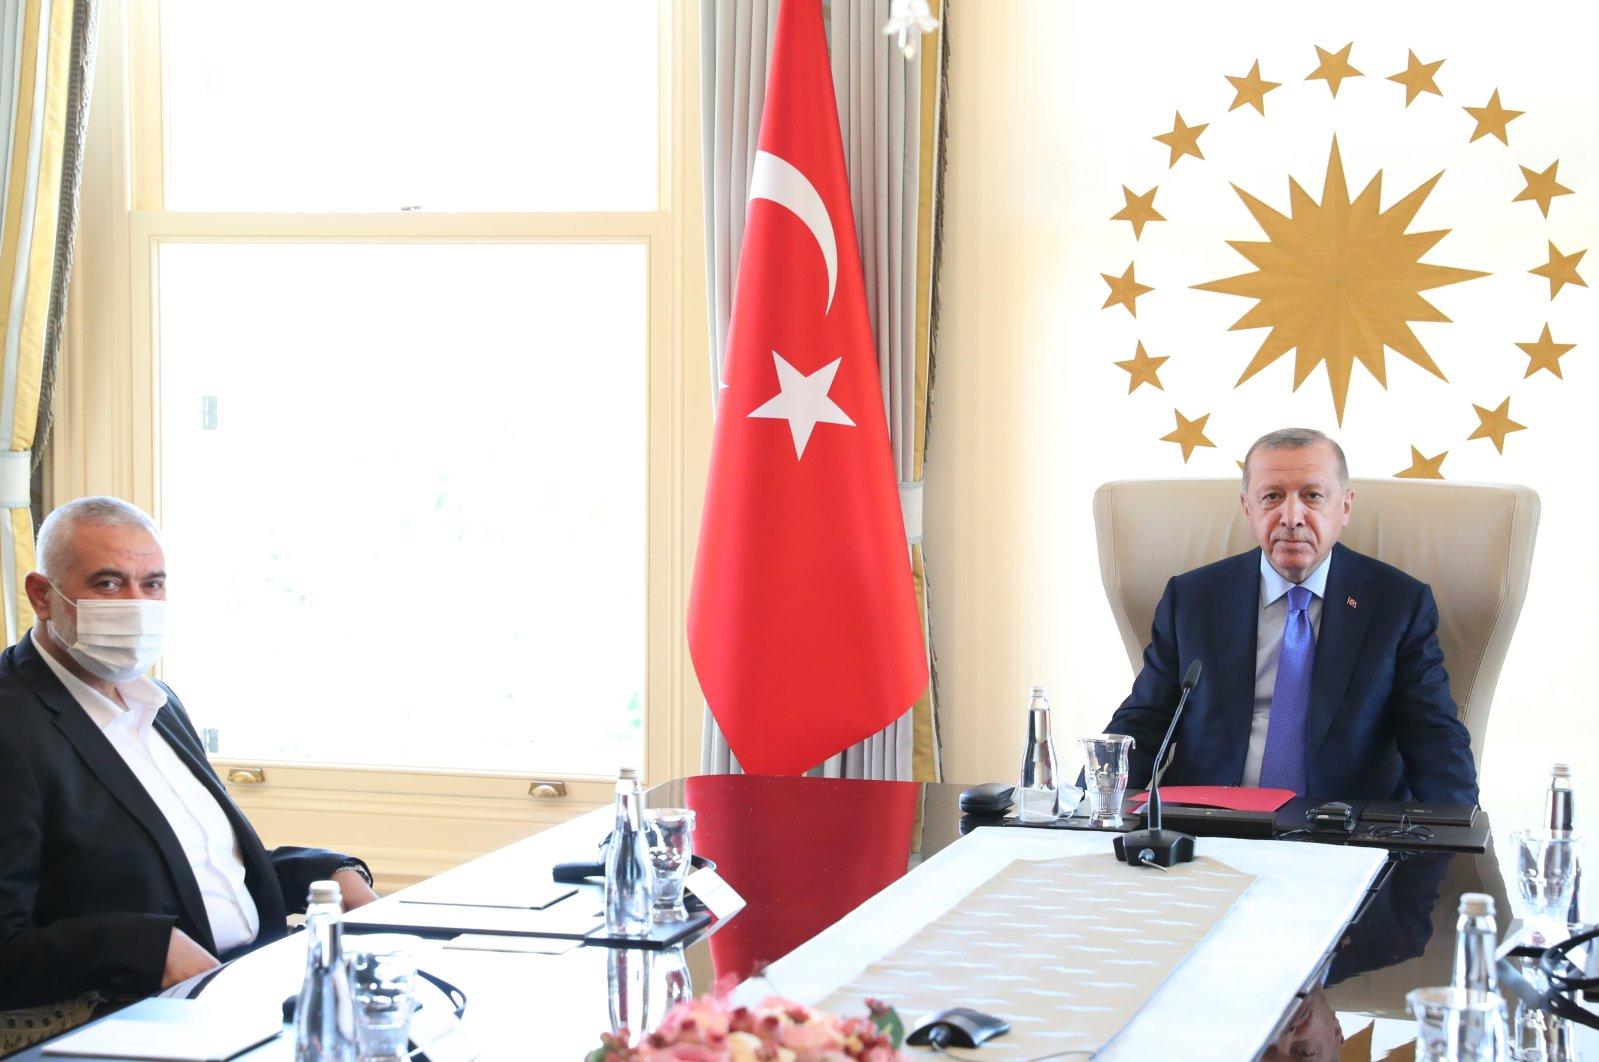 President Recep Tayyip Erdoğan receives Ismail Haniyeh, the political head of Hamas, in Istanbul, Turkey, Aug. 22, 2020. (AA Photo)